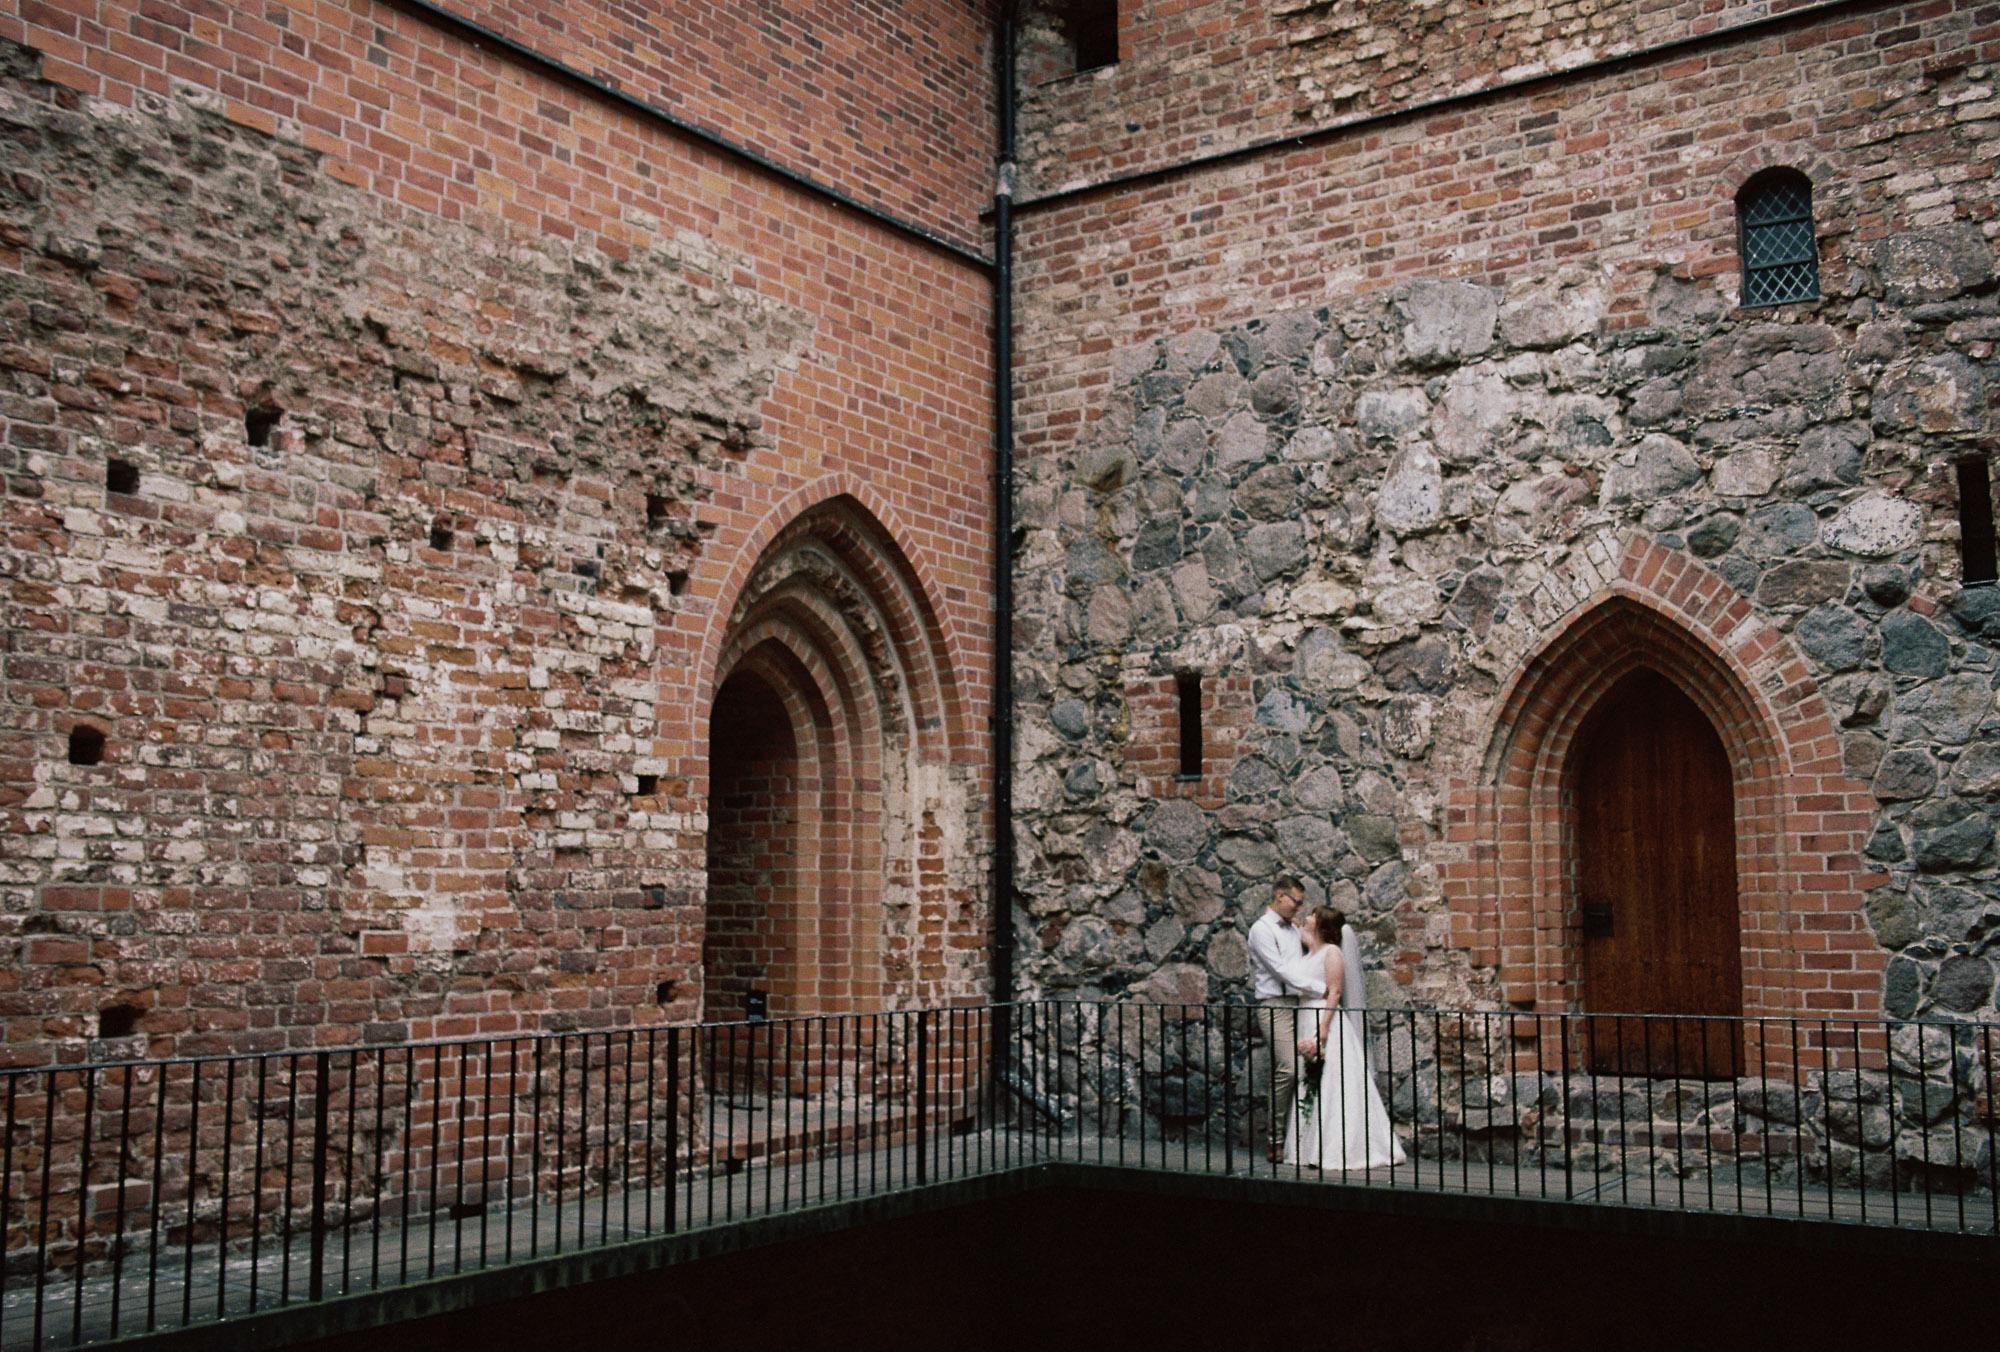 jere-satamo-analog-film-wedding-photographer-finland-179.jpg